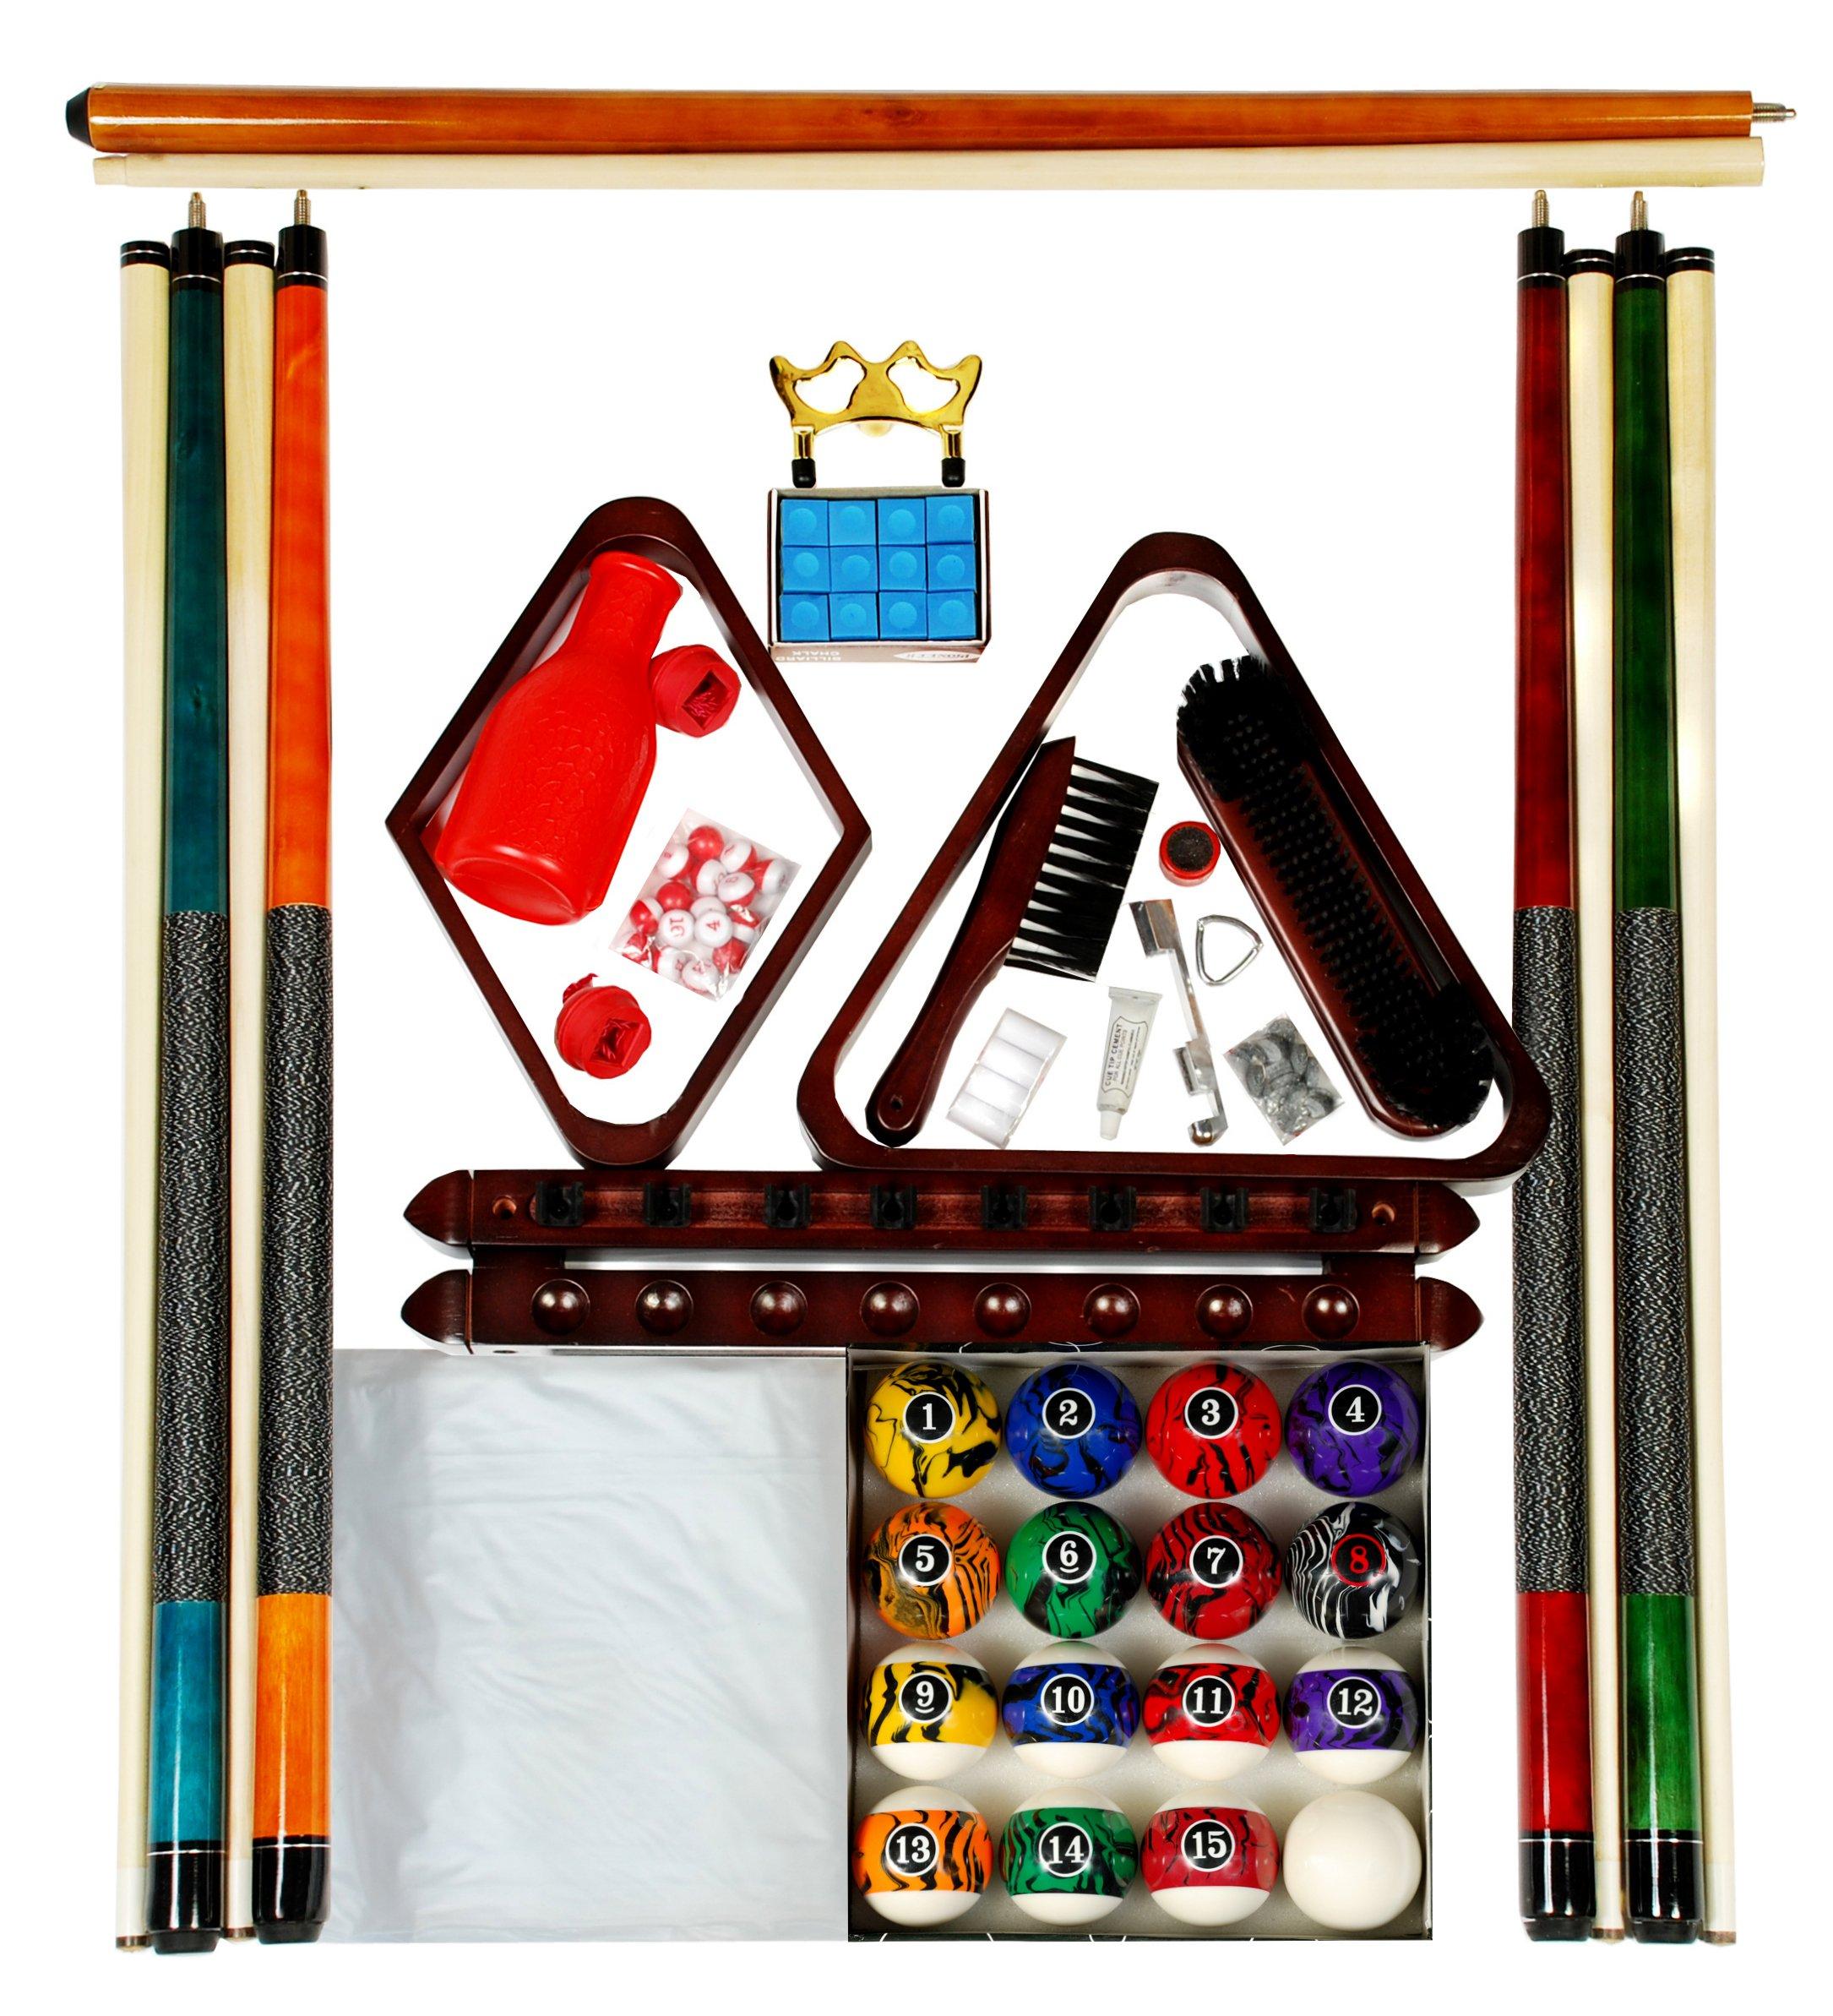 Billiard Pool Table Accessory Kit W/ Dark Marble - Swirl Style Ball Set Mahogany Finish